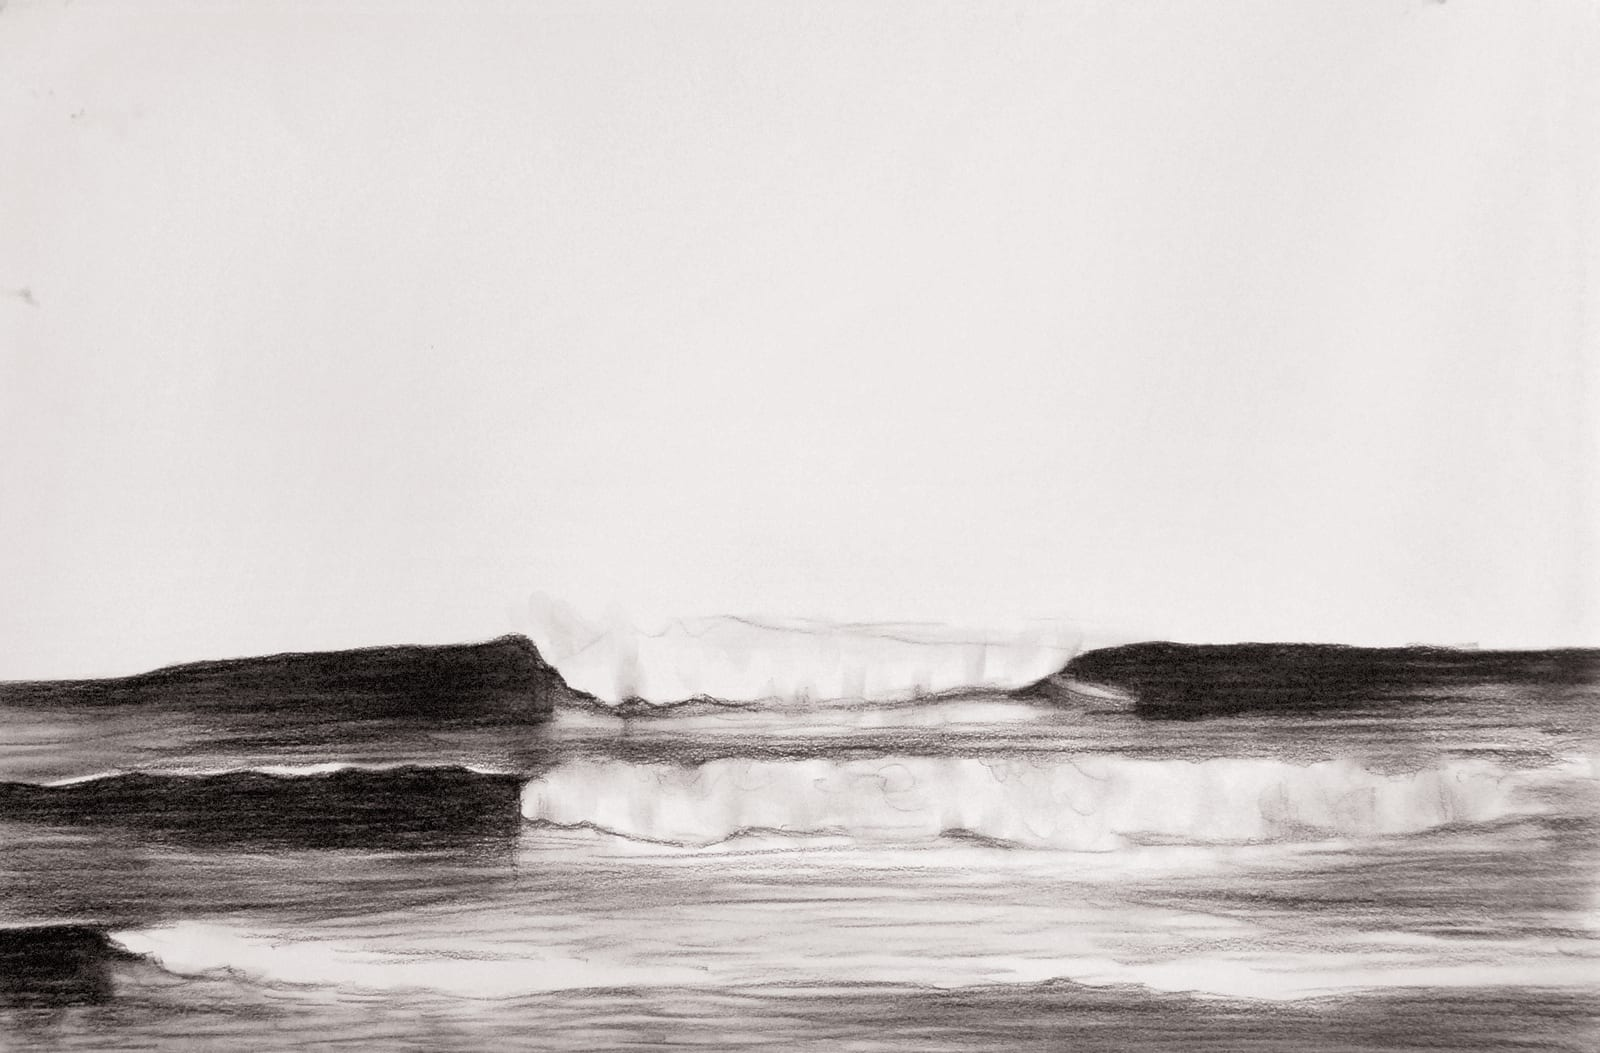 Wang Gongyi 王公懿, The Sea Diary 大海日記, 2010